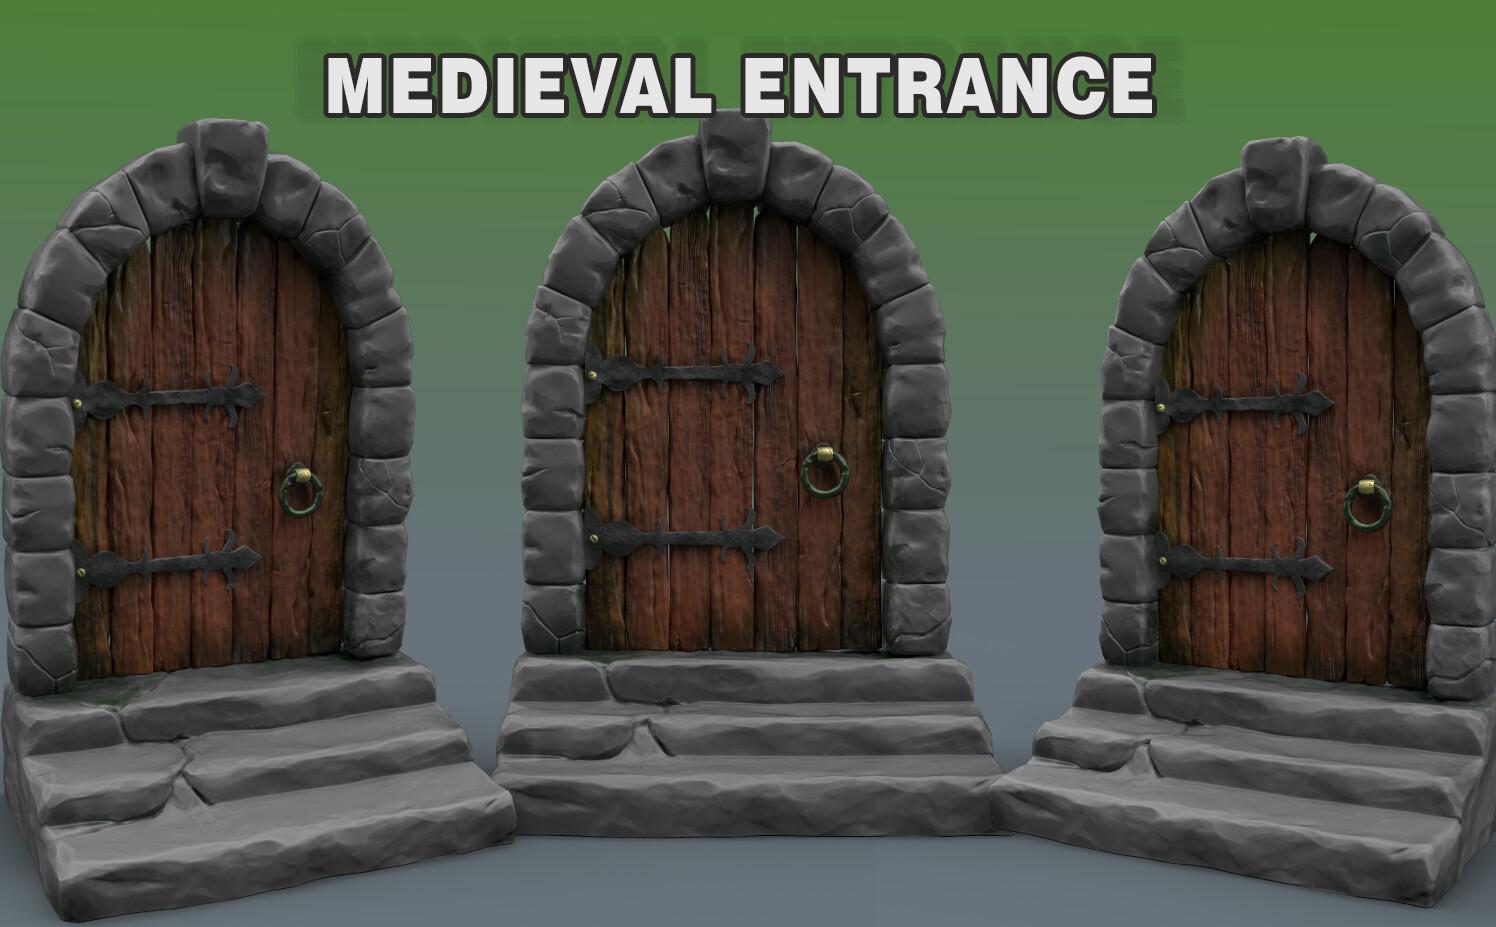 Medieval Entrance - Julien Bernier